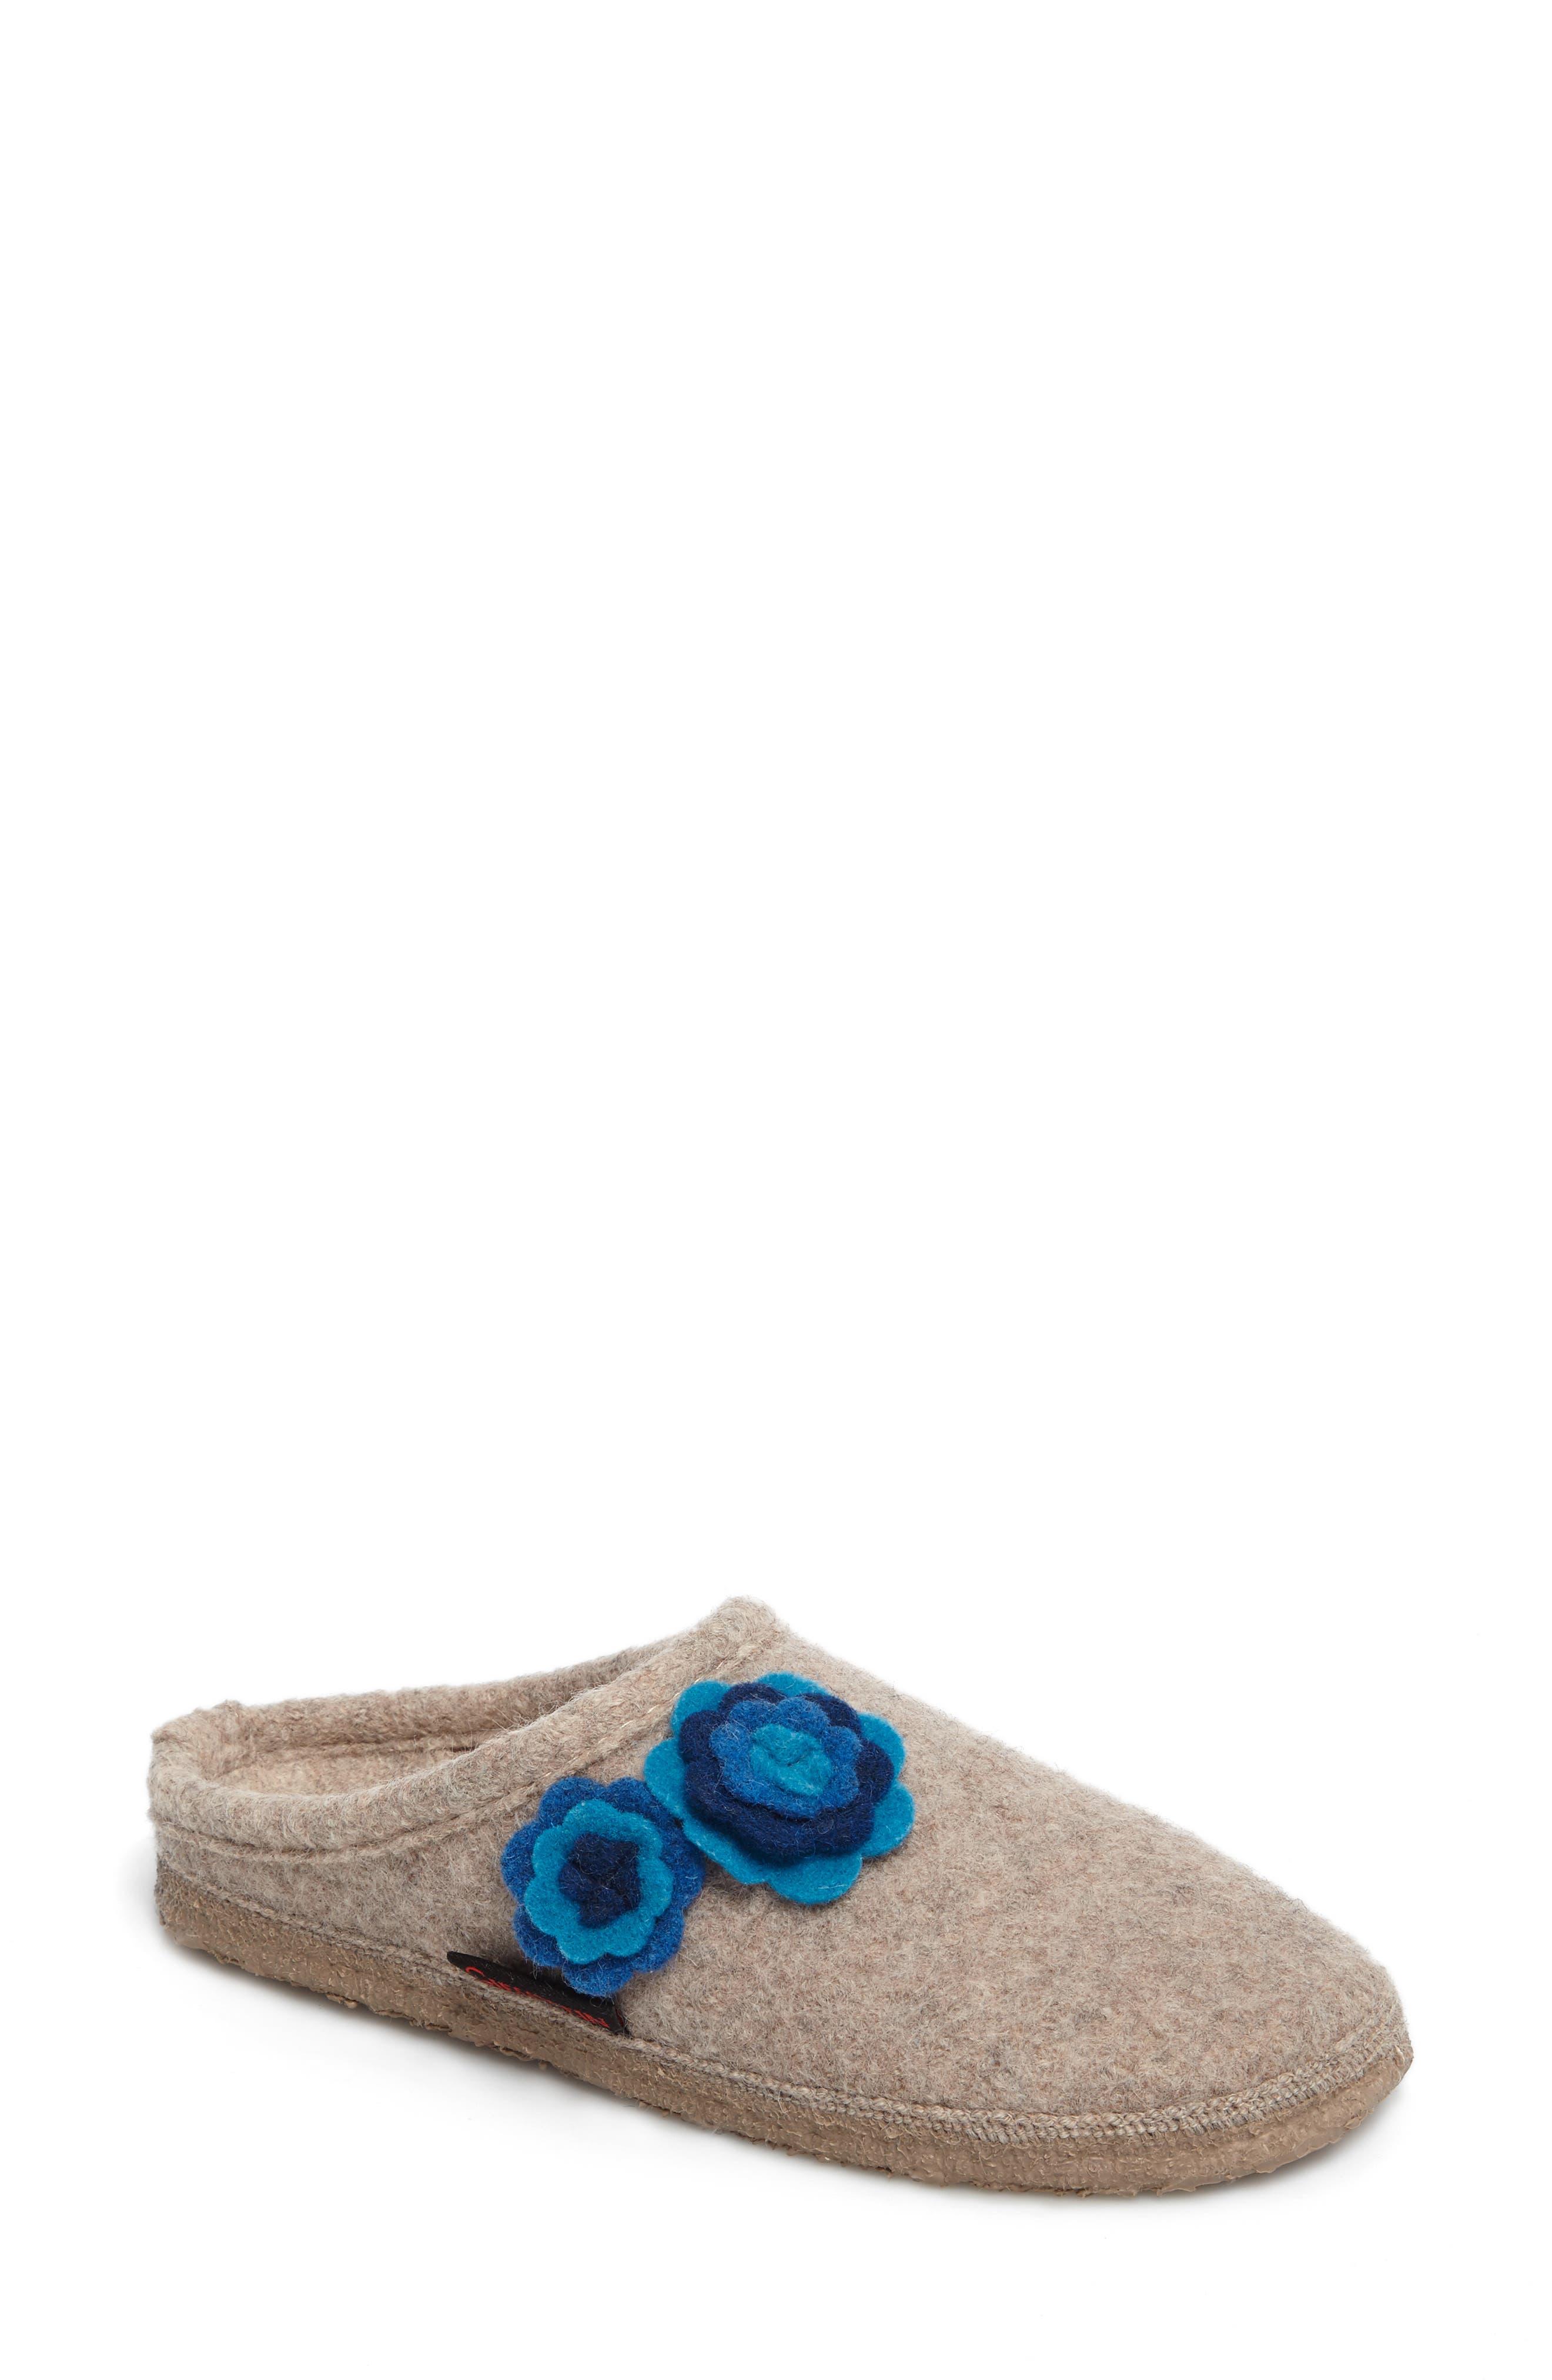 Georgie Indoor Boiled Wool Slipper,                             Main thumbnail 1, color,                             NATURAL WOOL